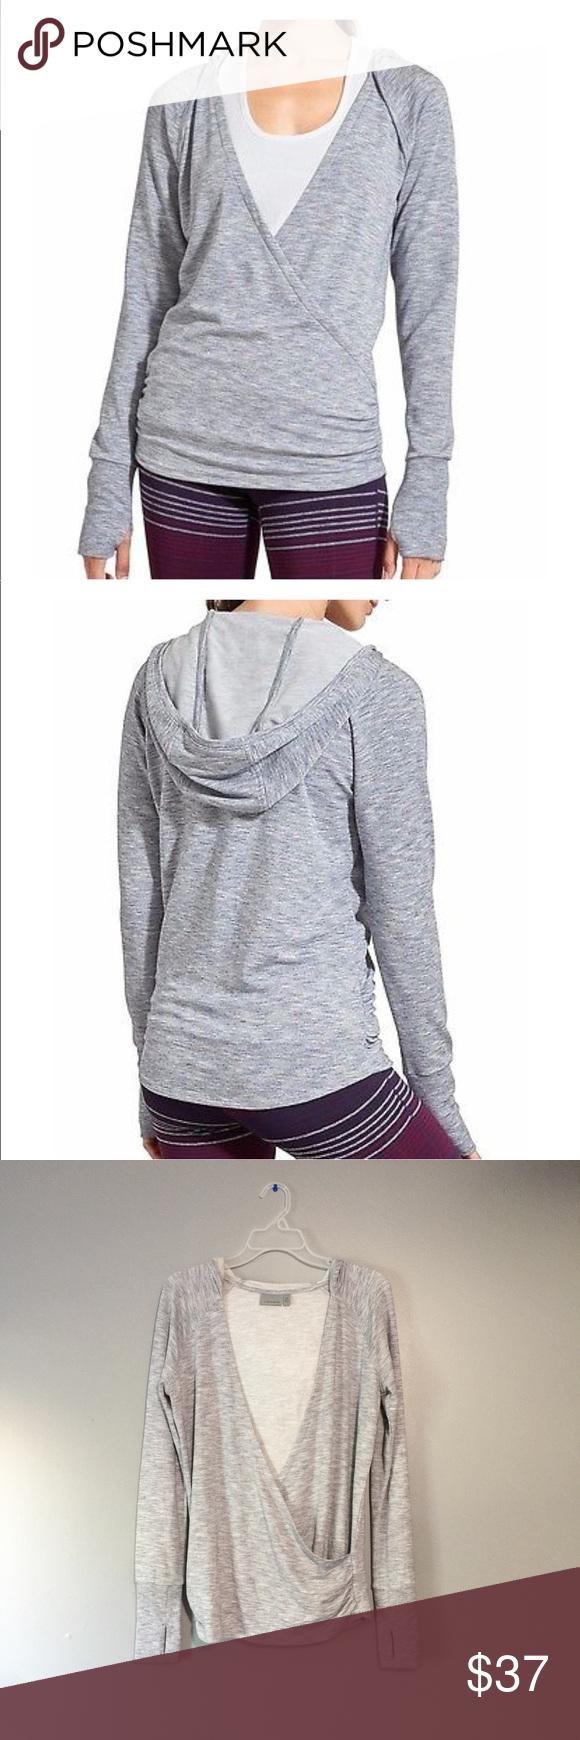 Athleta Studio Wrap Hoodie Gray Size Sx Athleta Studio Wrap Hoodie Gray Size Sx Perfect Condition Athleta Tops Sweatshirts Fashion Women Shopping Grey Hoodie [ 1740 x 580 Pixel ]